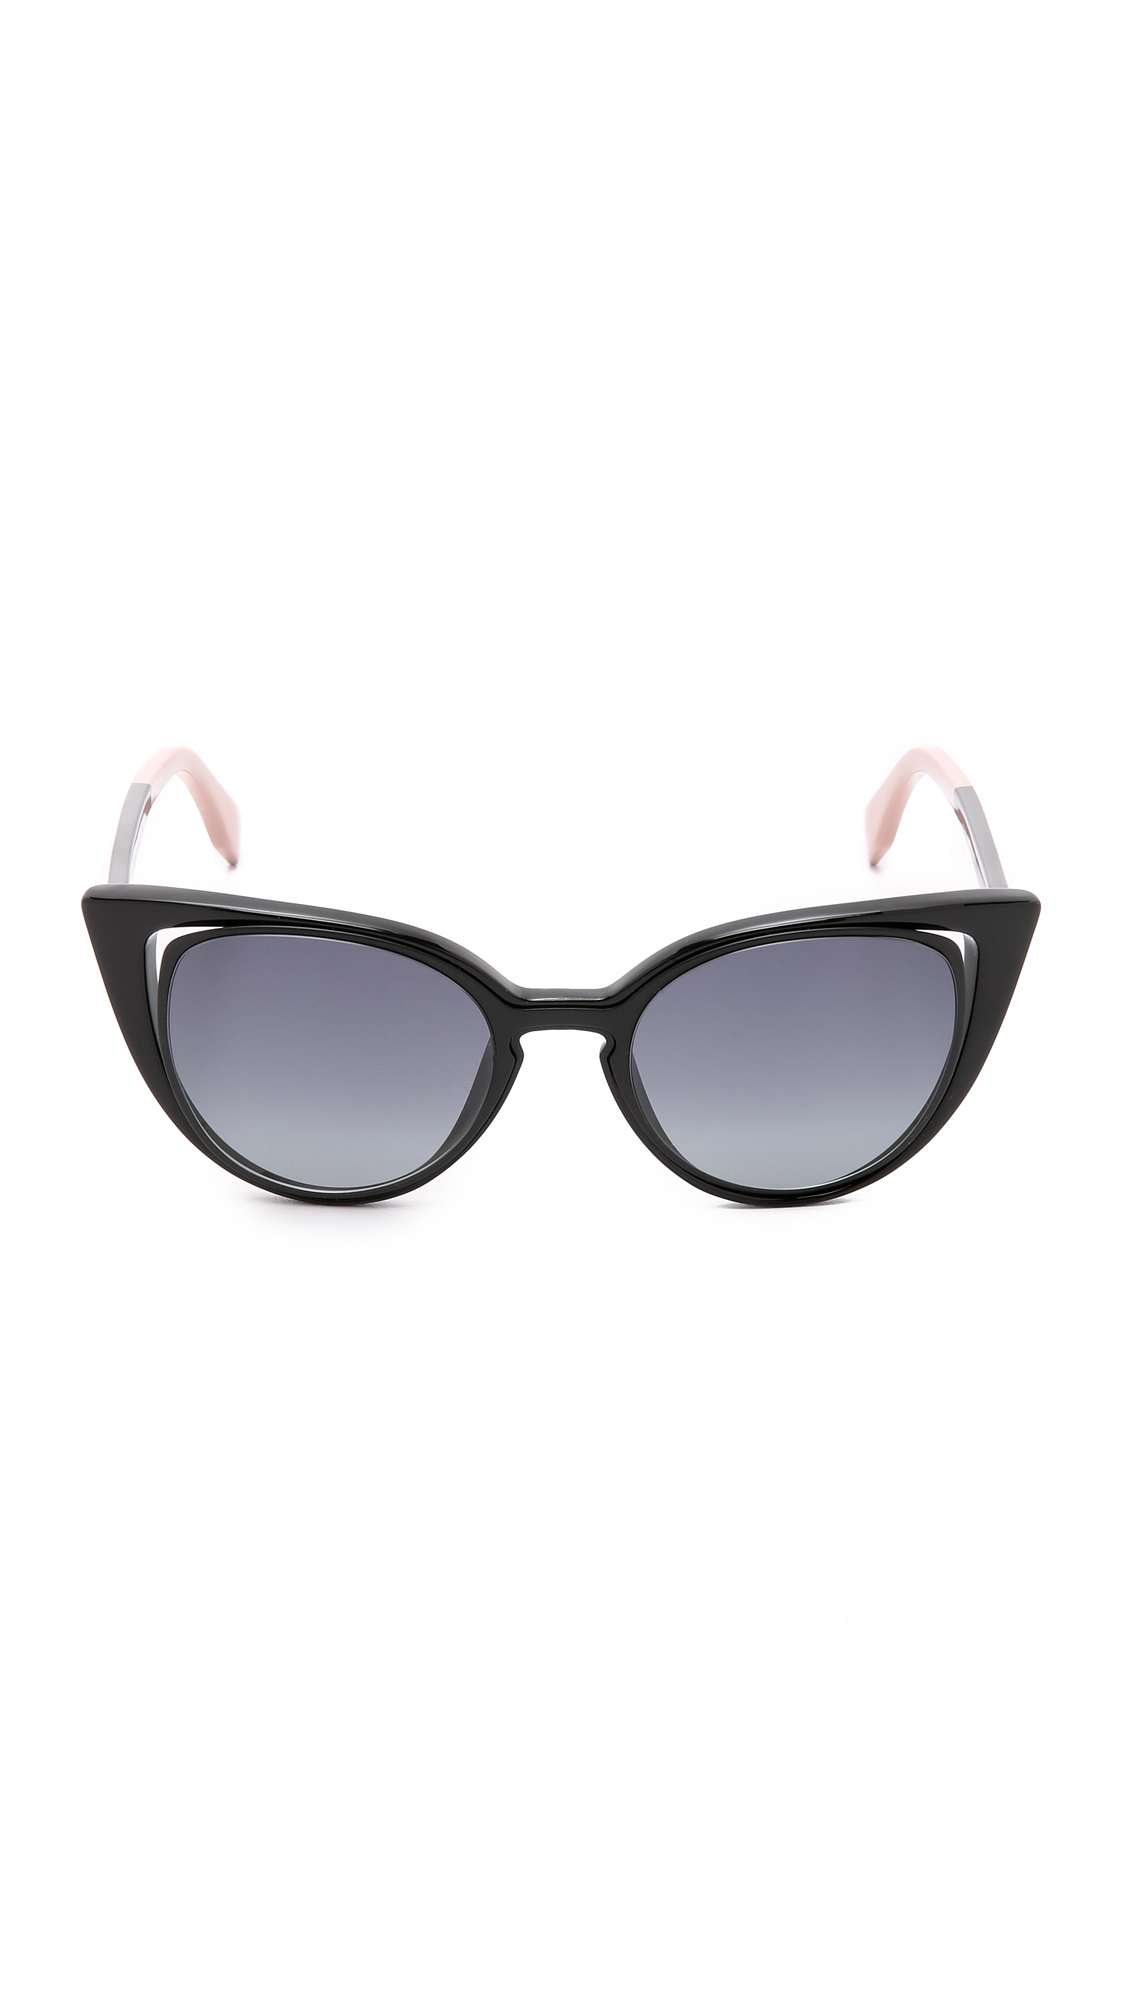 ec5c3f4d06 Fendi Cat Eye Sunglasses Black - Bitterroot Public Library